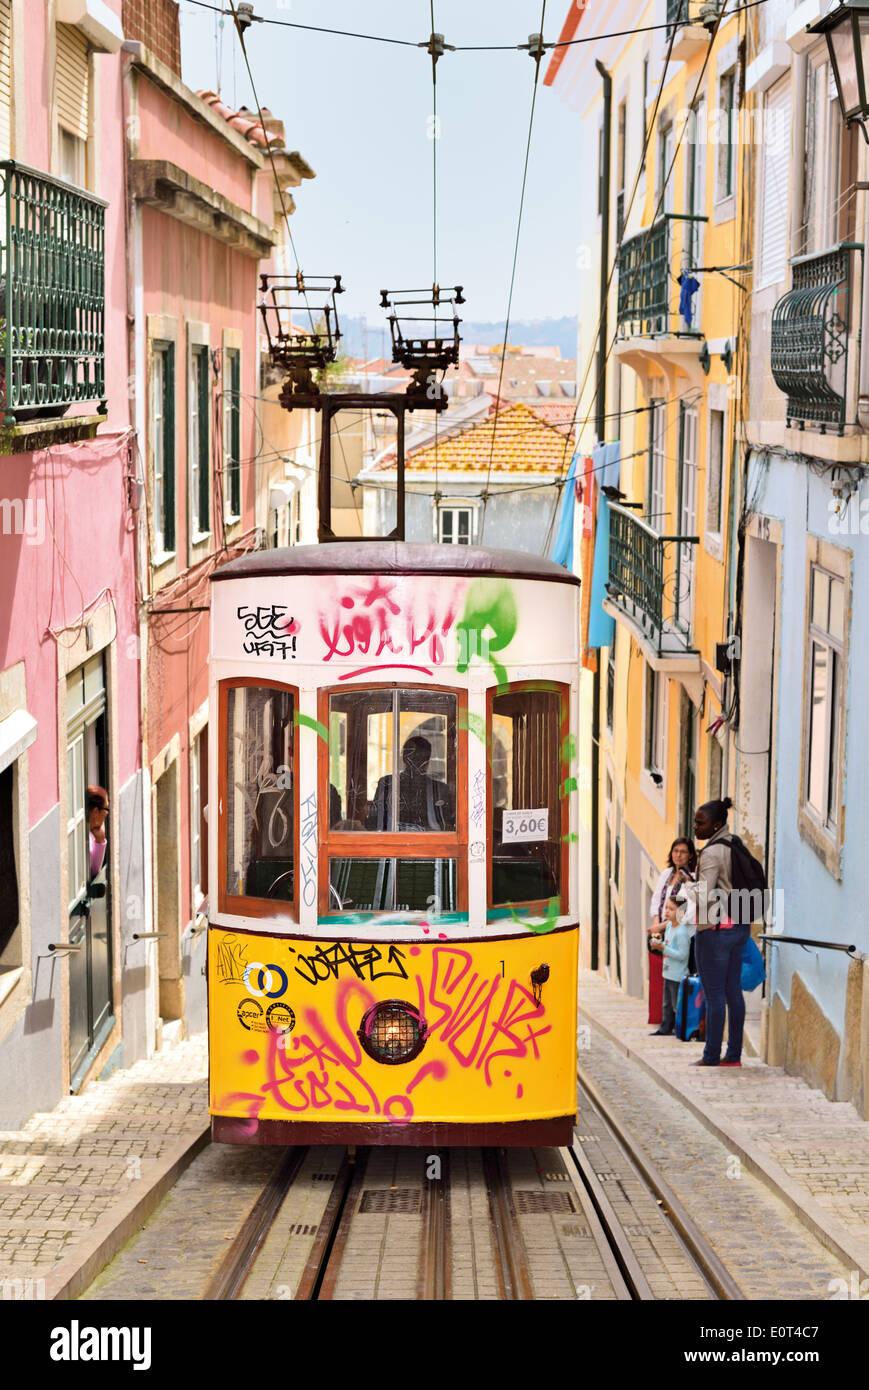 Portugal, Lisbonne: rue historique ascenseur Elevador da Bica Photo Stock